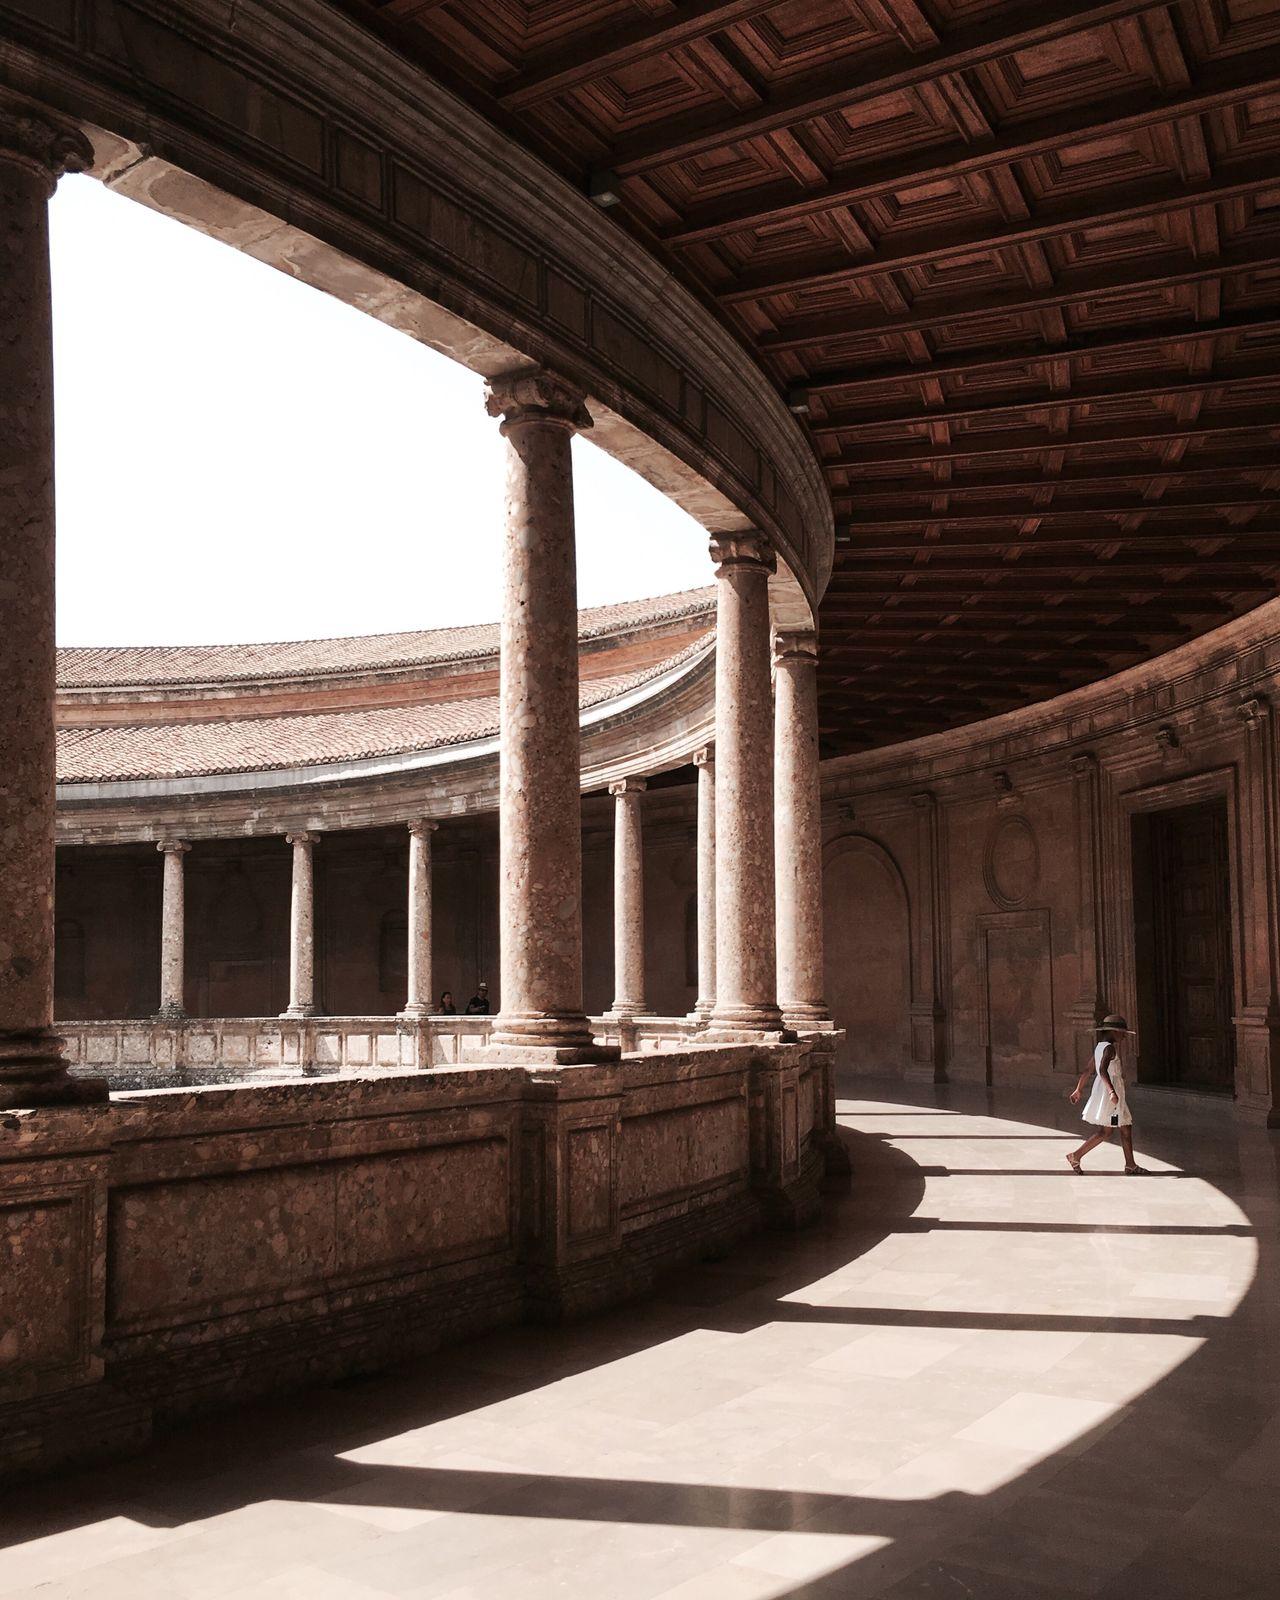 VIEW OF HISTORICAL BUILDING IN CORRIDOR